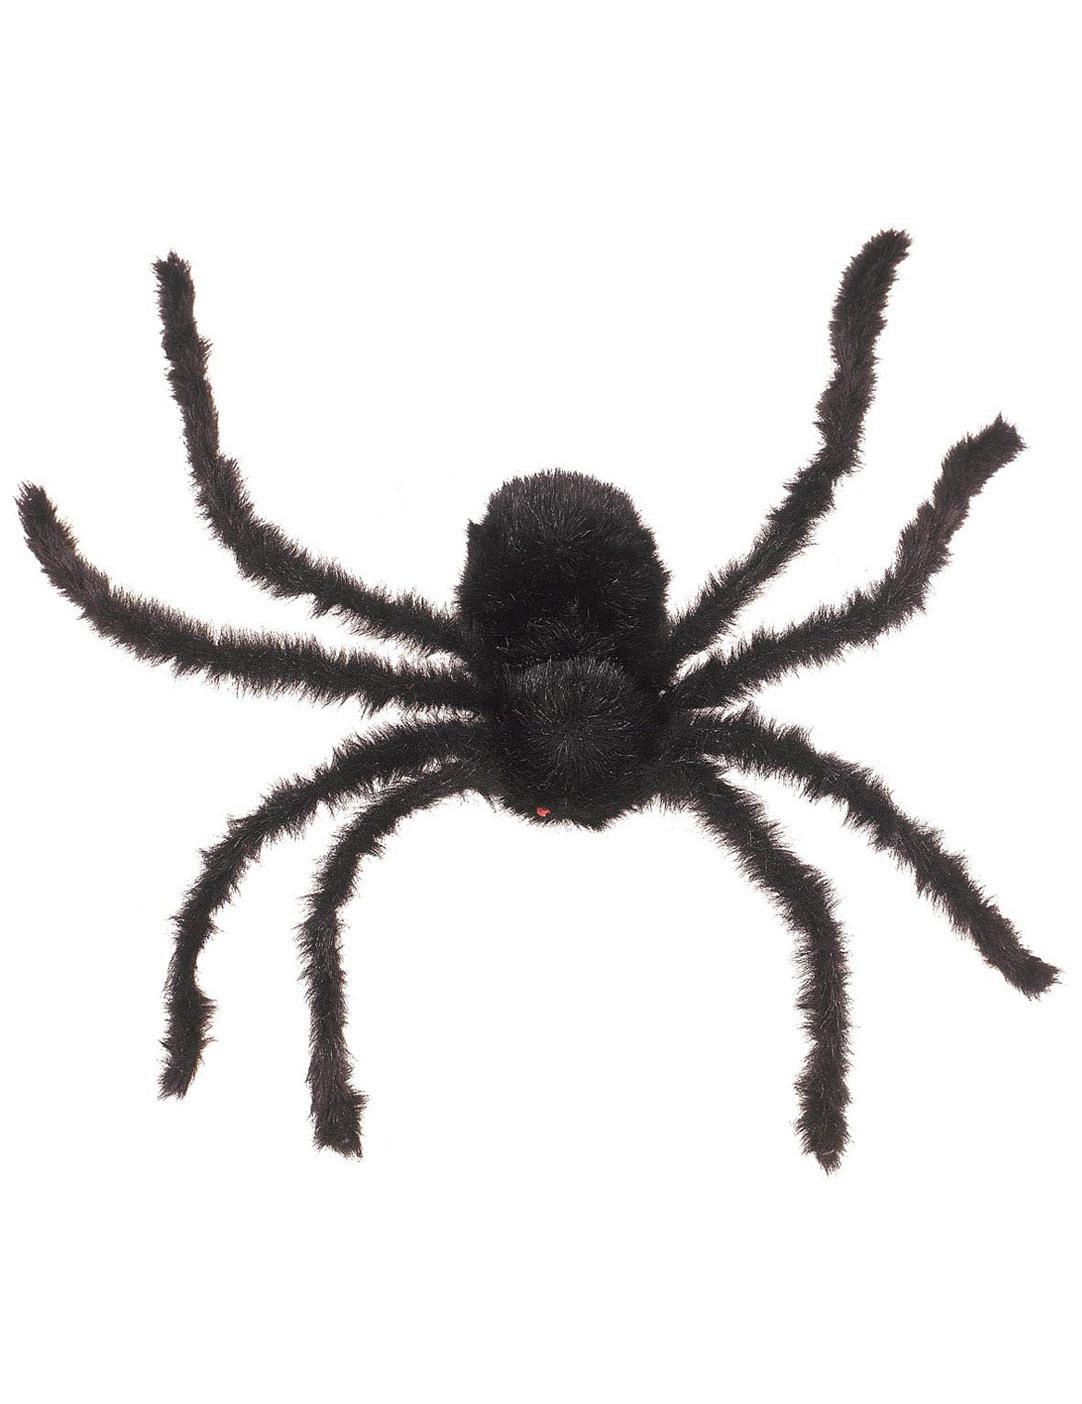 behaarte riesenspinne halloween deko schwarz 75cm. Black Bedroom Furniture Sets. Home Design Ideas